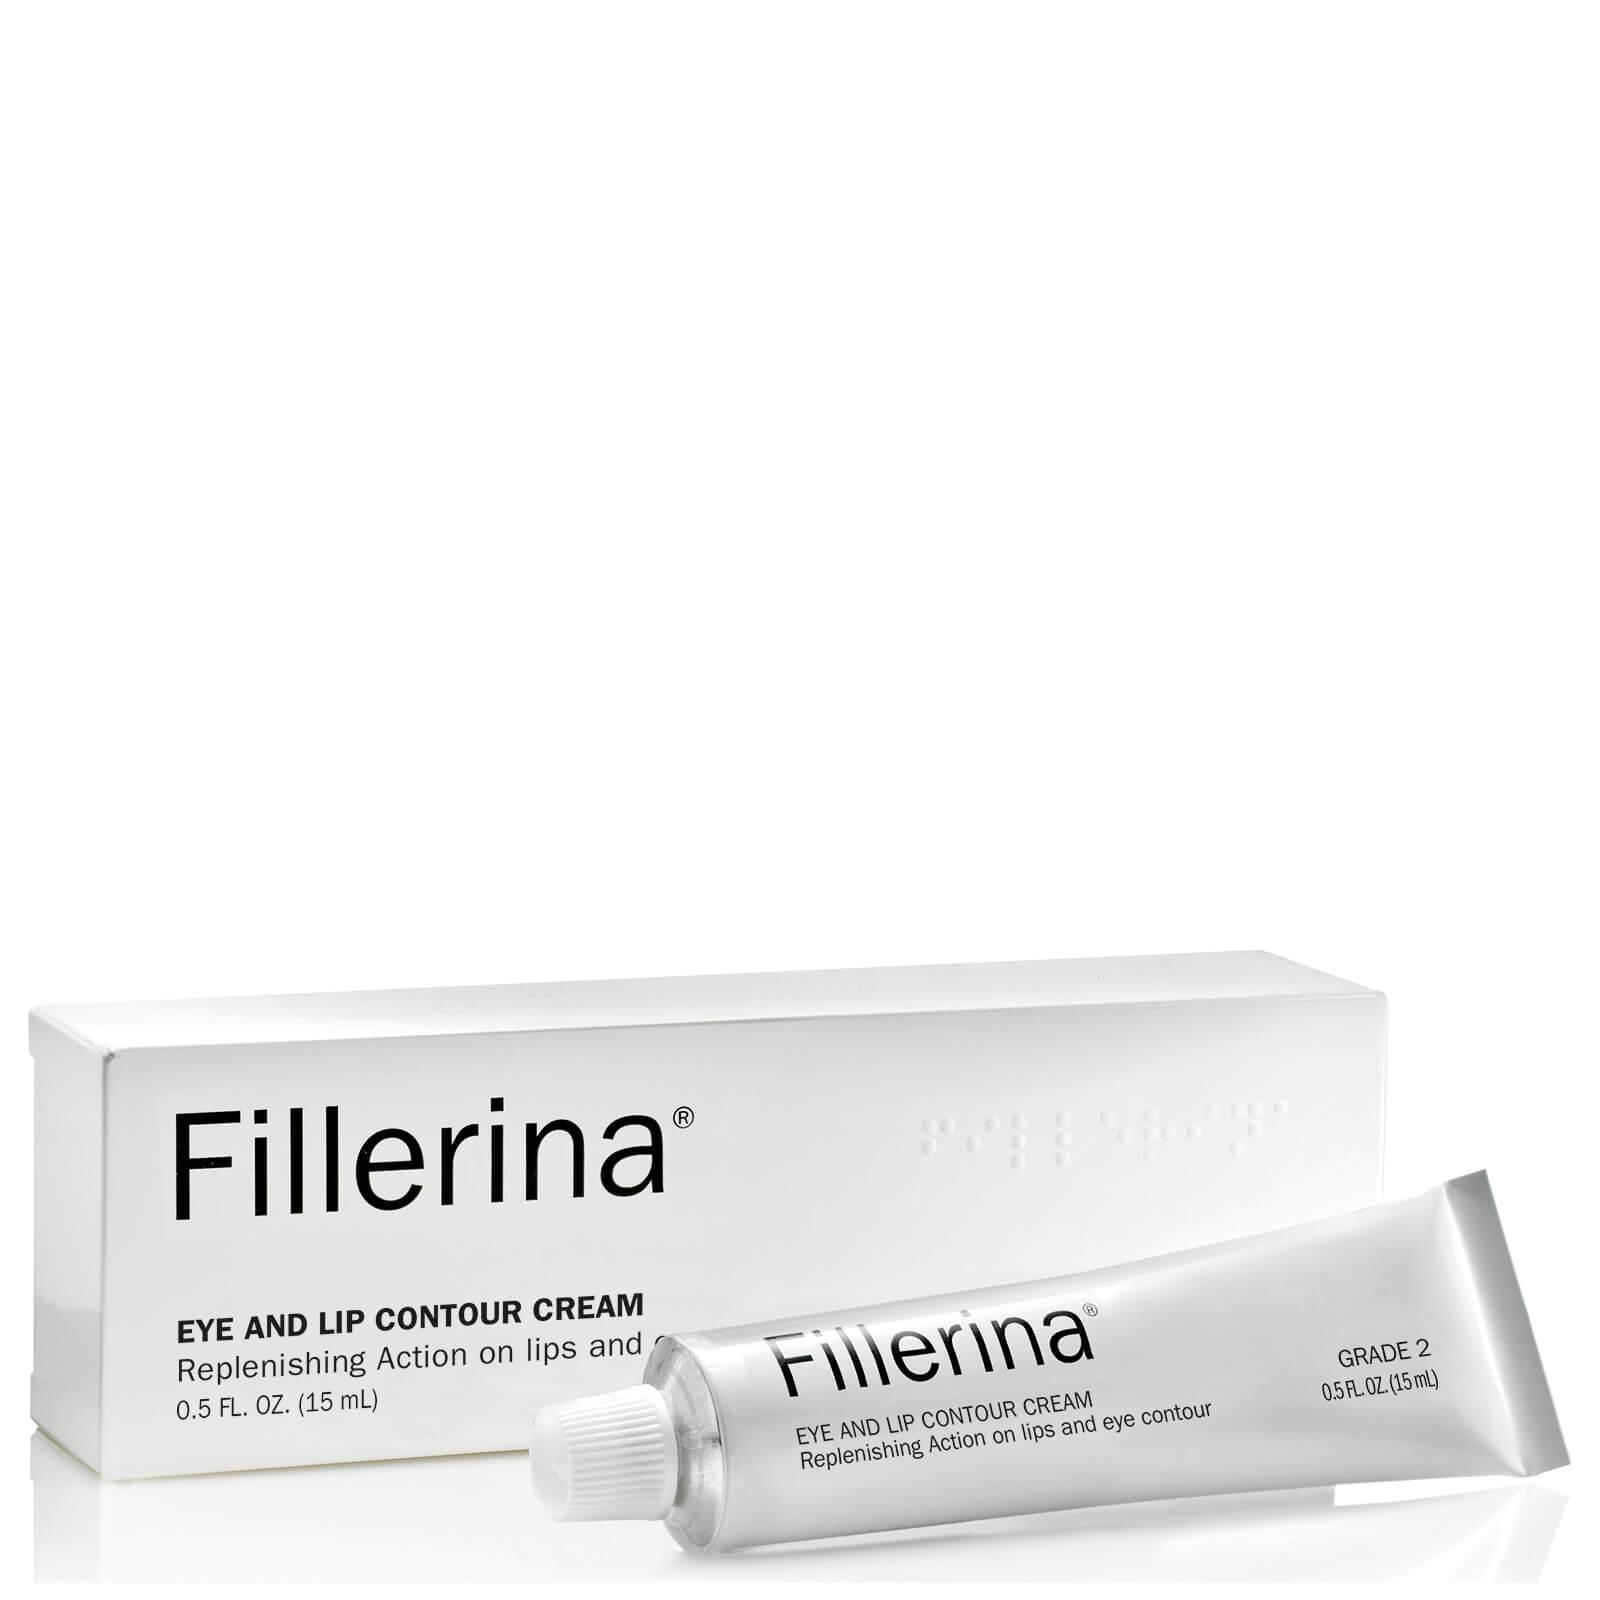 Fillerina, Eye and Lip Cream Grade 2, 15 ml thumbnail